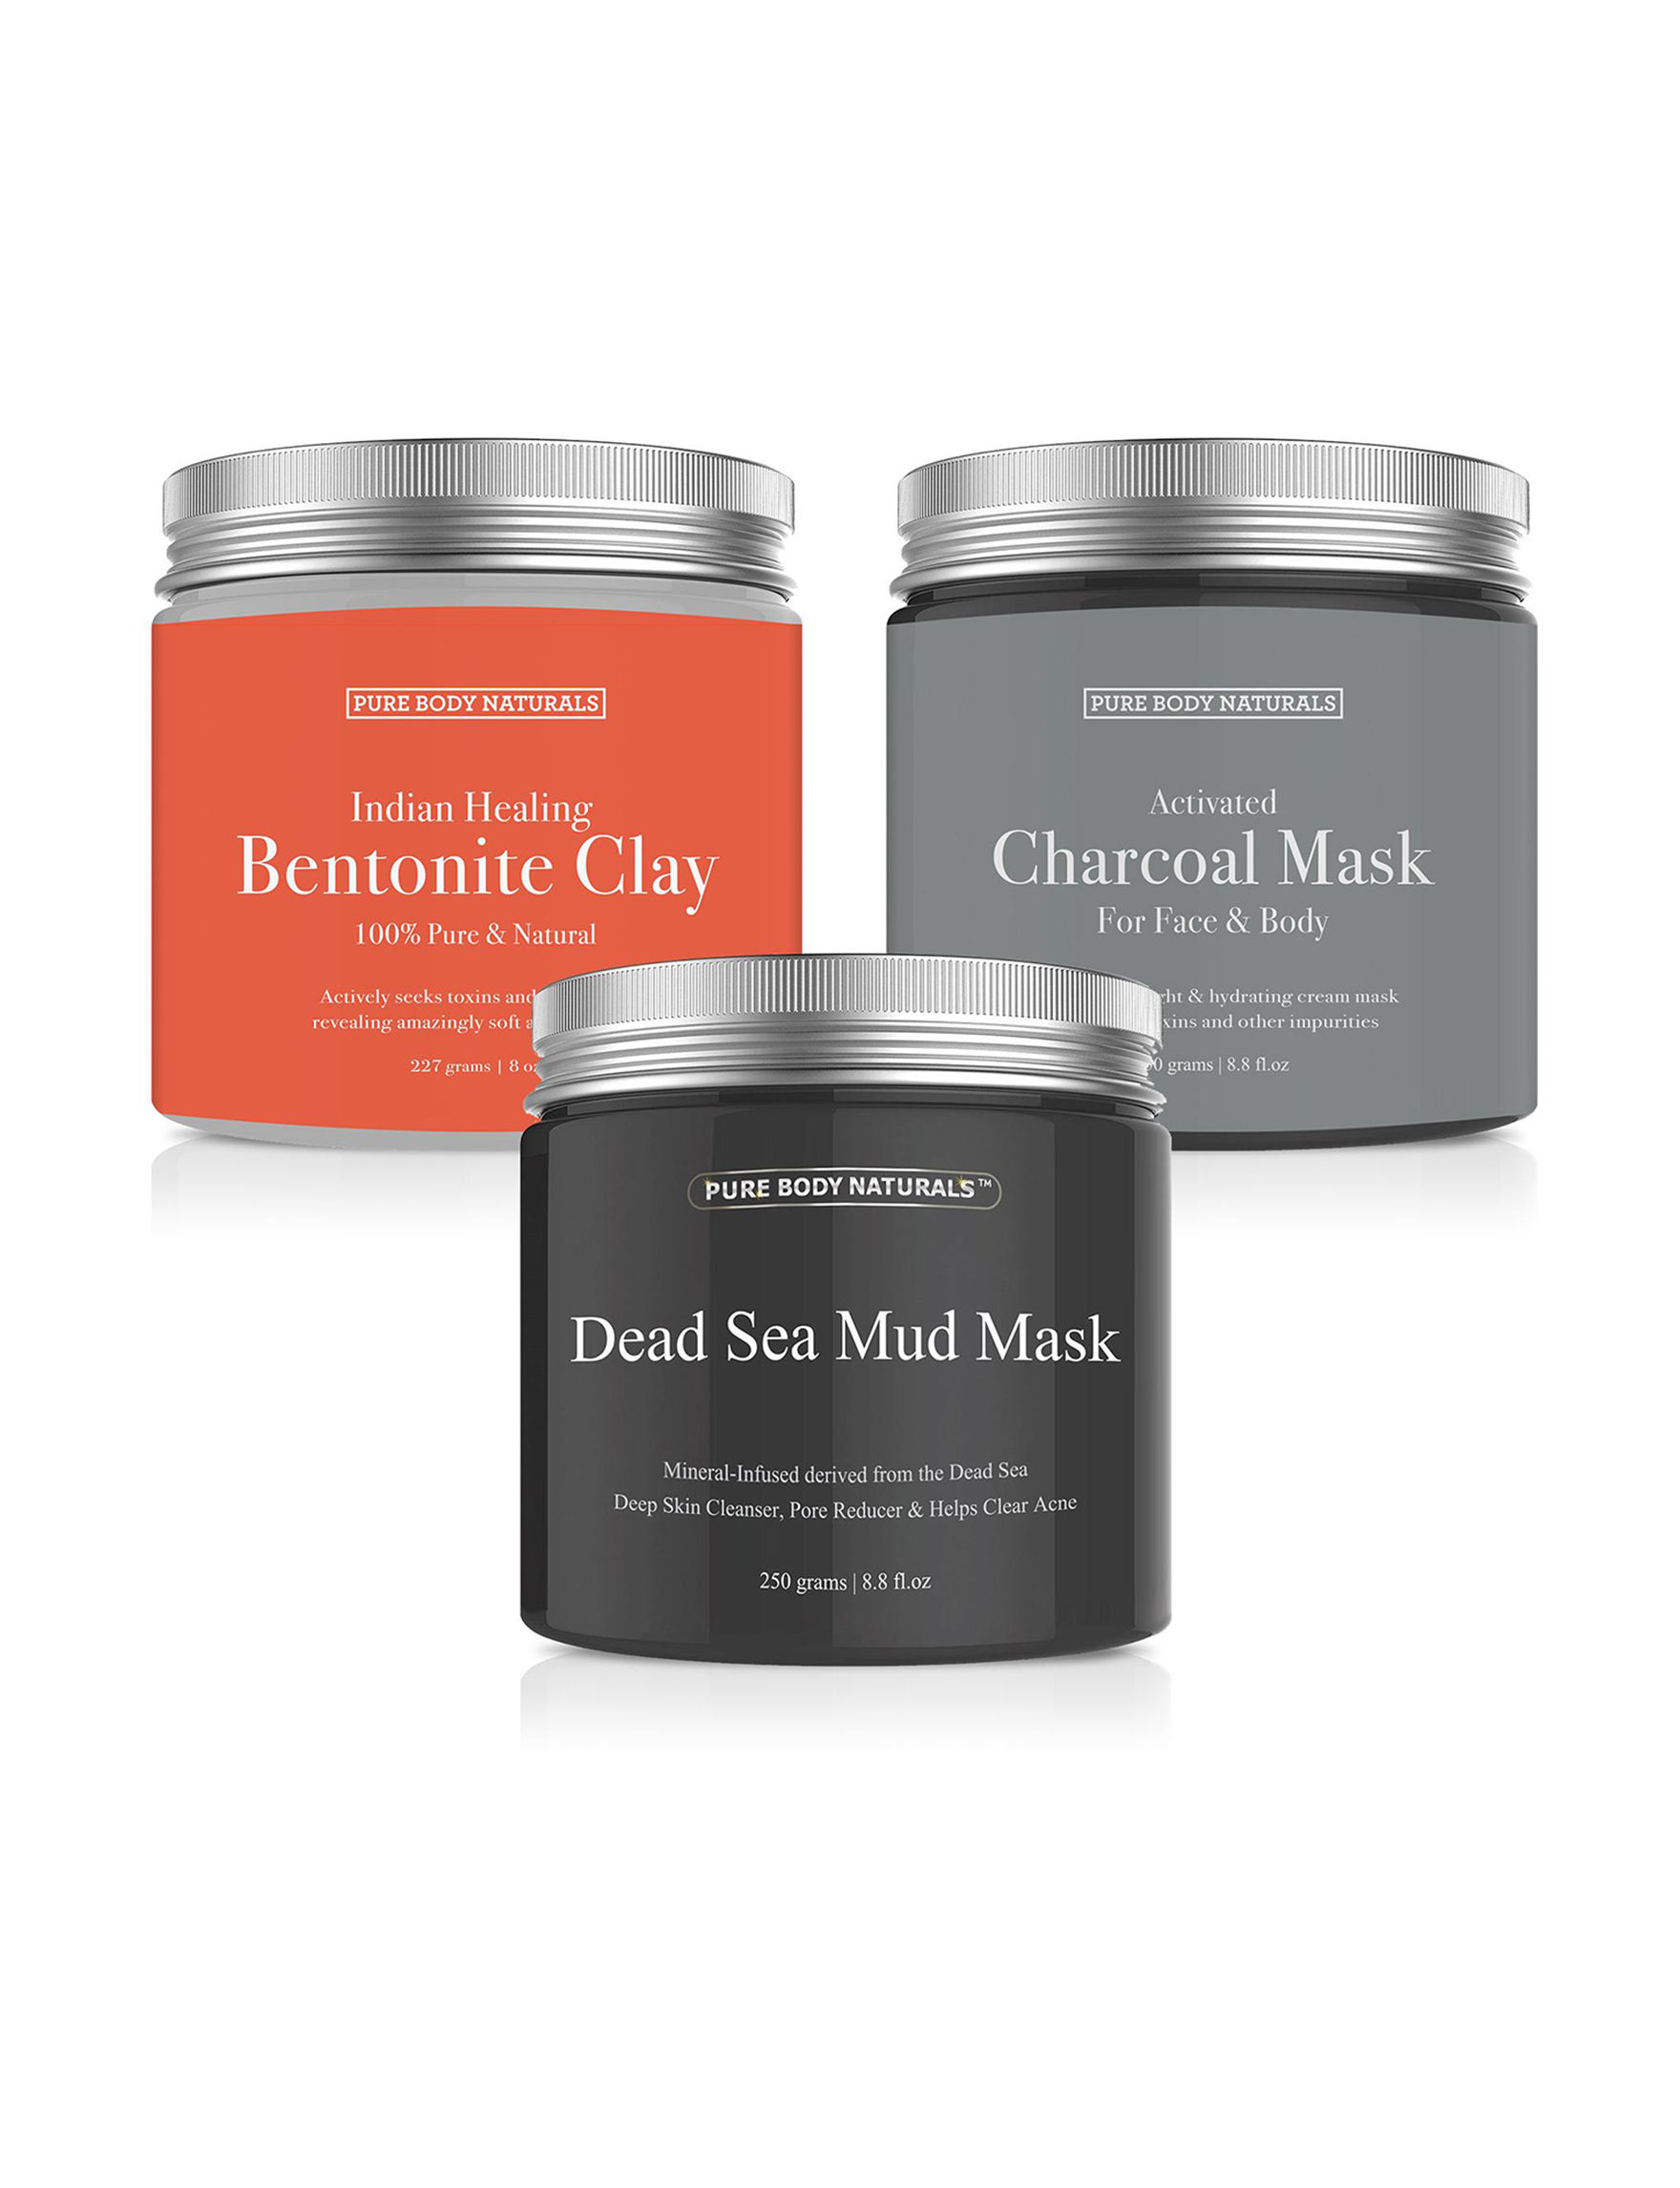 Pure Body Naturals  Exfoliators Face Masks Skin Care Kits & Sets